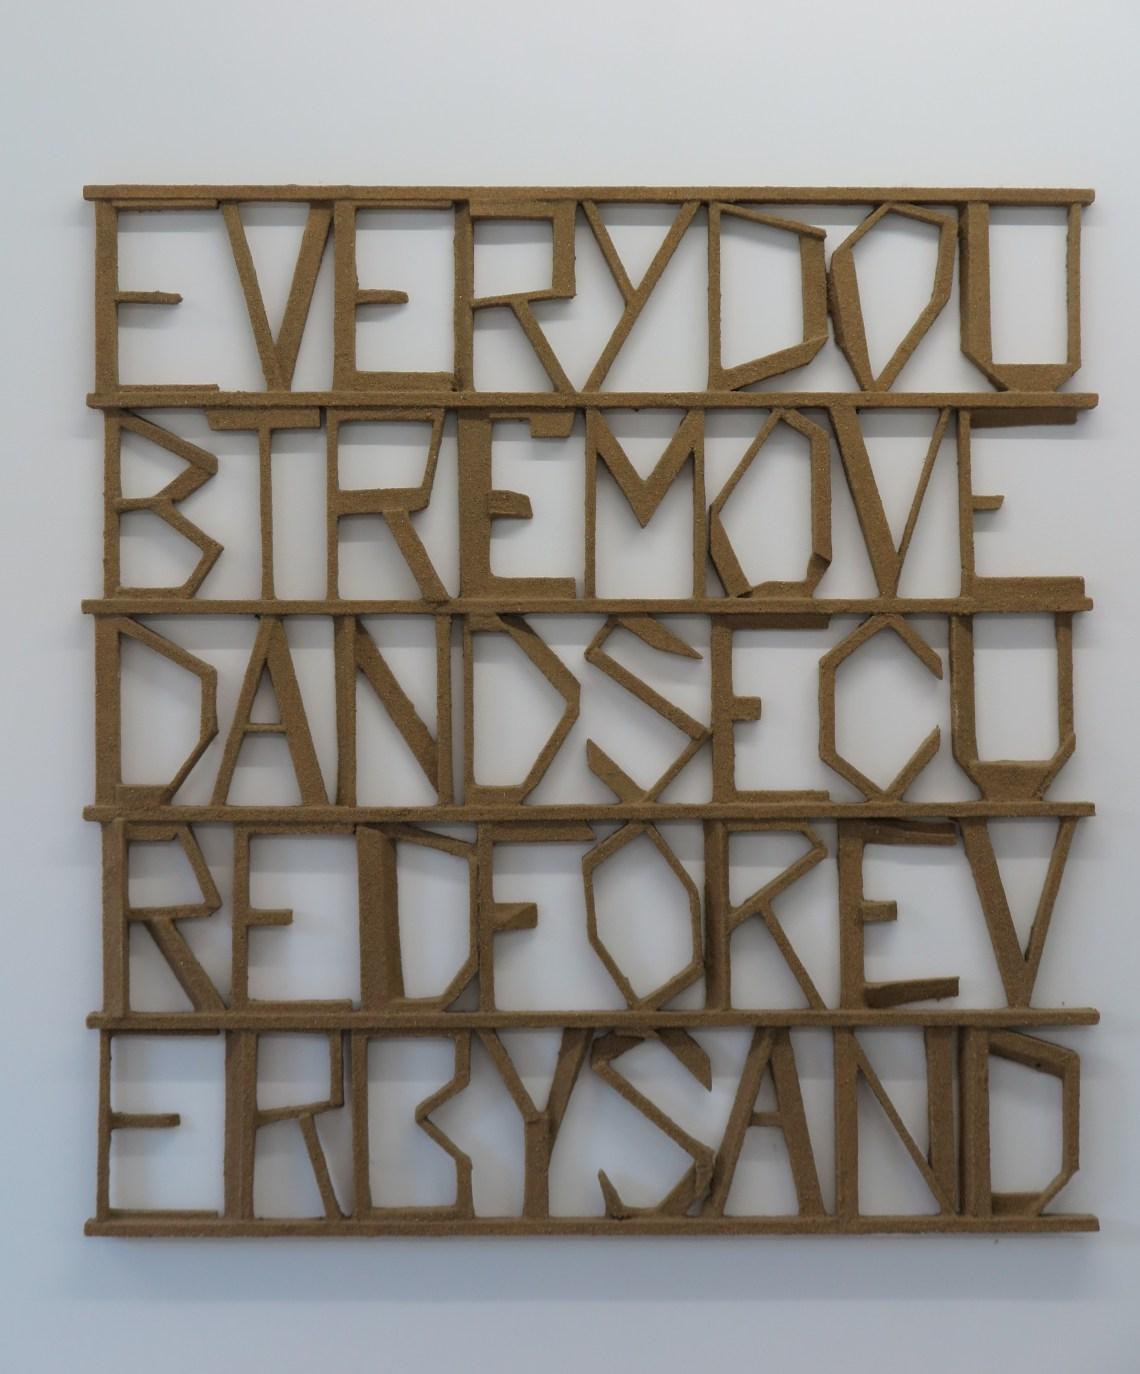 Gerard Koek - Words27 - 2013